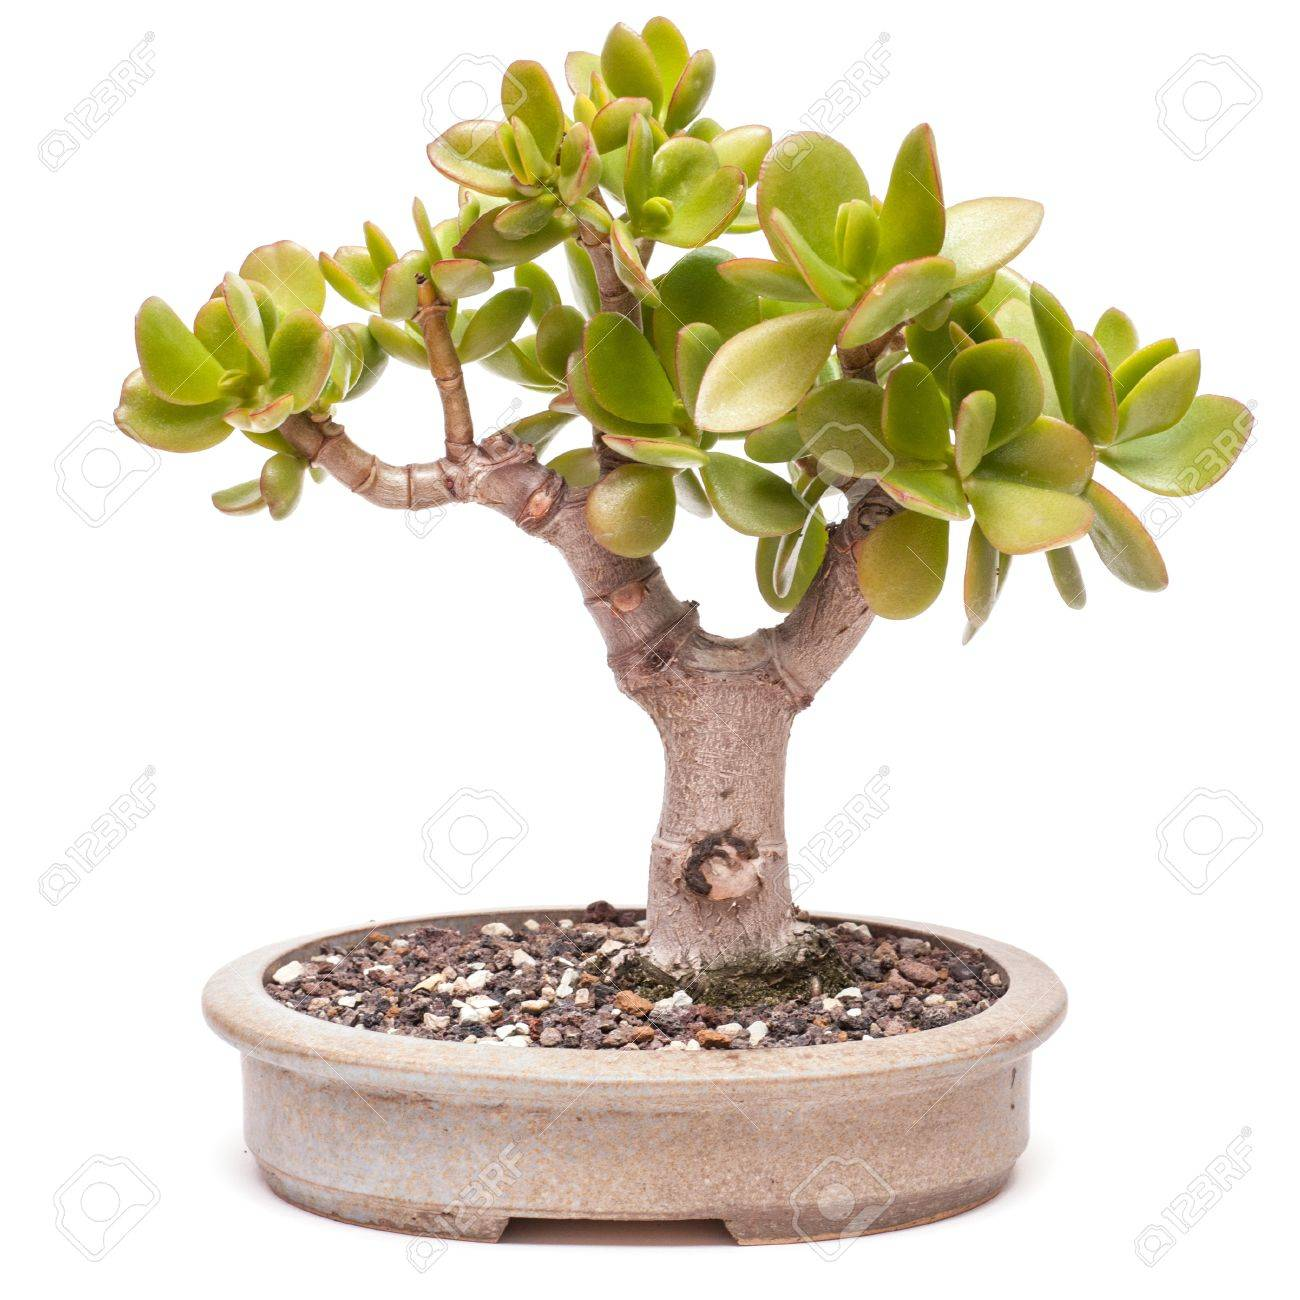 Money Tree (Crassula Ovata) In A Pot As Bonsai Stock Photo ...